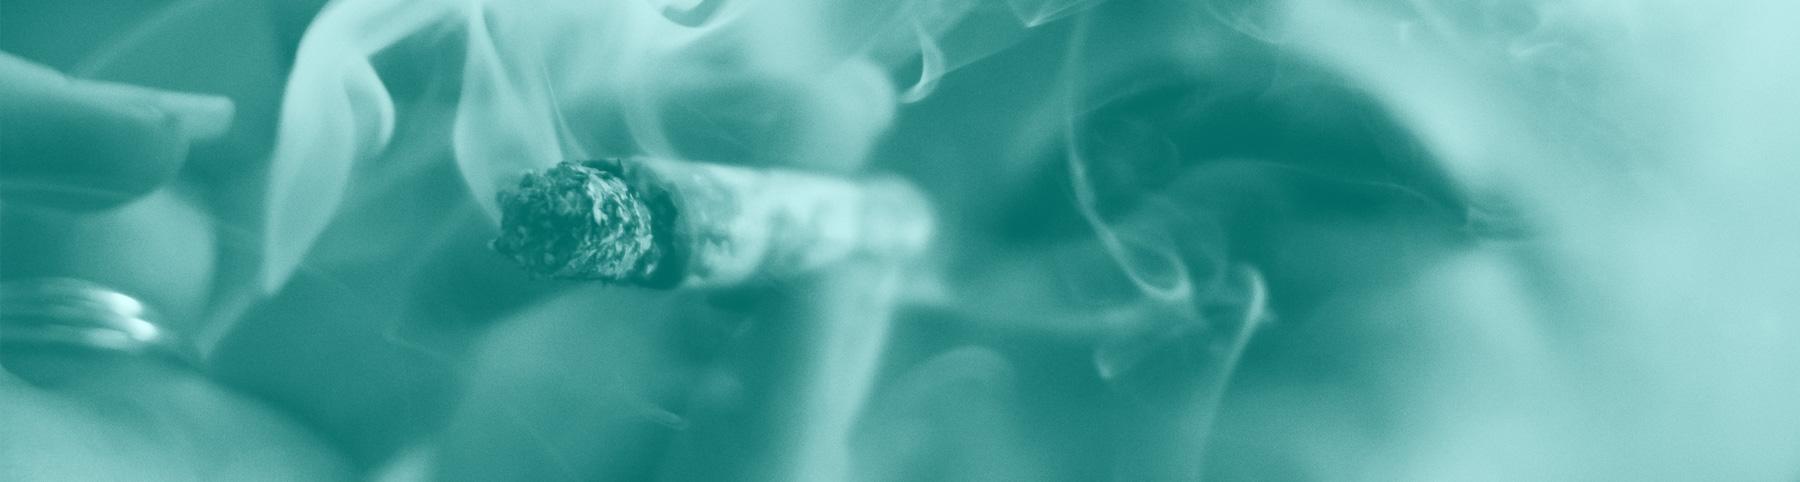 Break the Cycle of Substance Abuse with Marijuana Addiction Treatment -